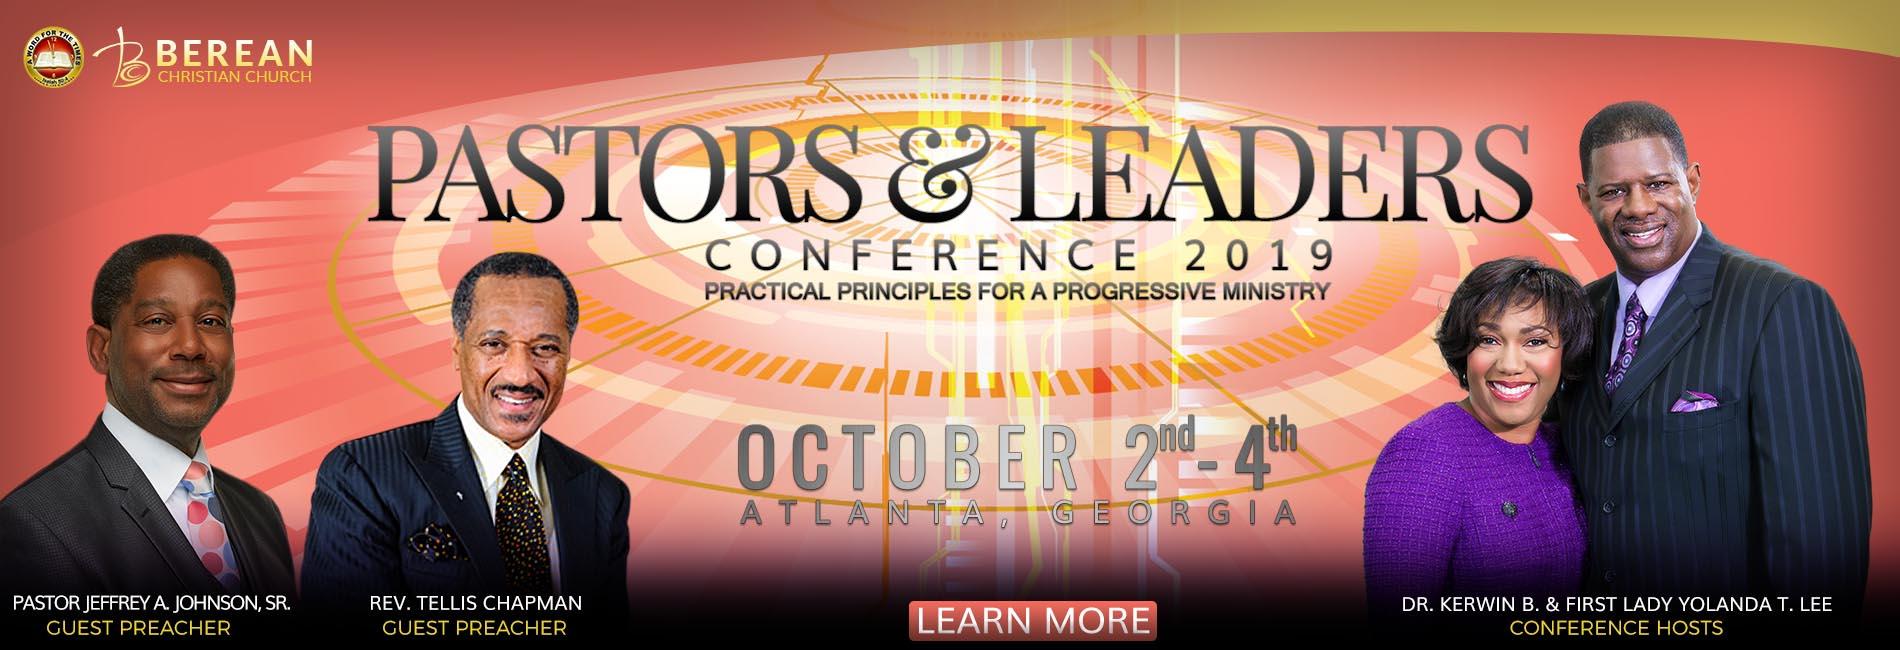 berean-pastors-conference-2019